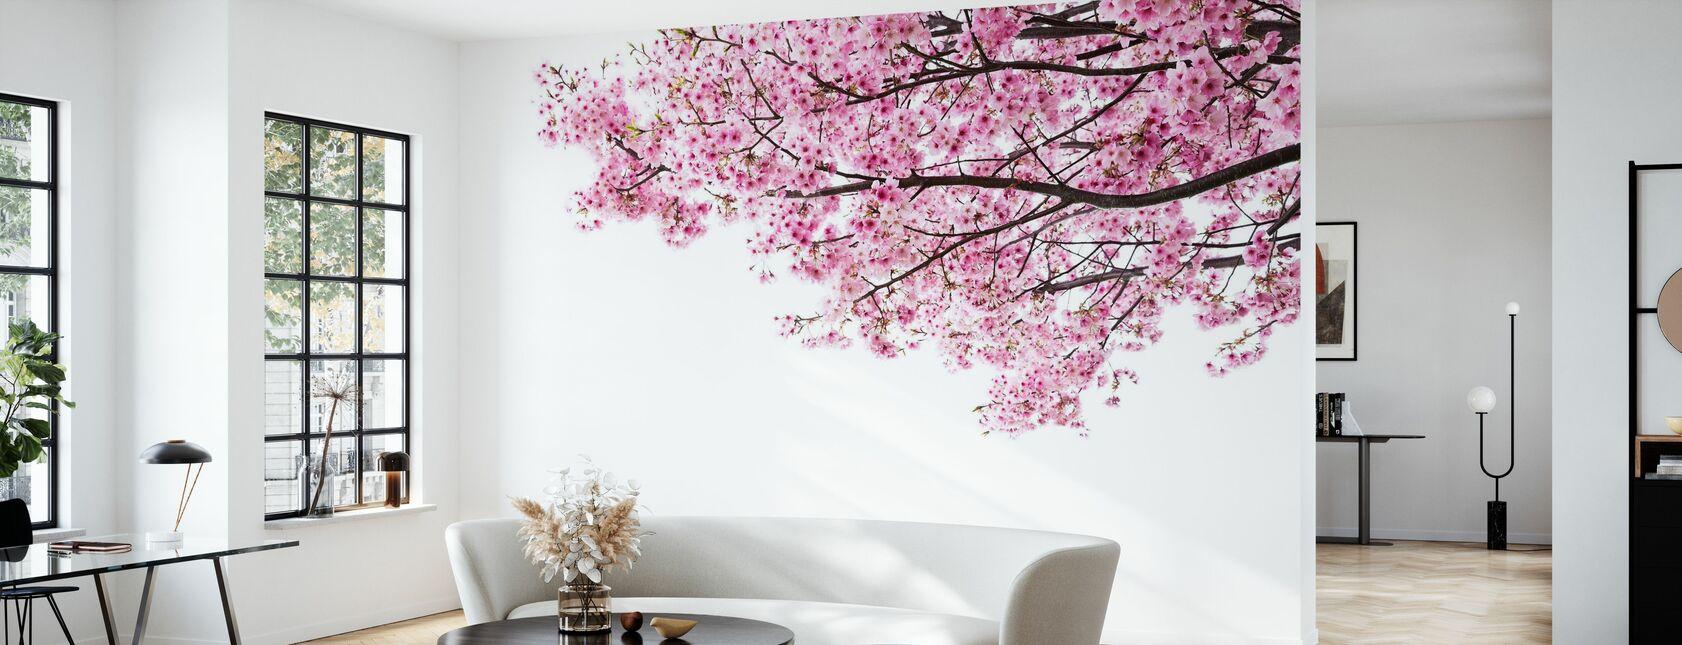 Rosa Kirsebærblomster - Tapet - Stue